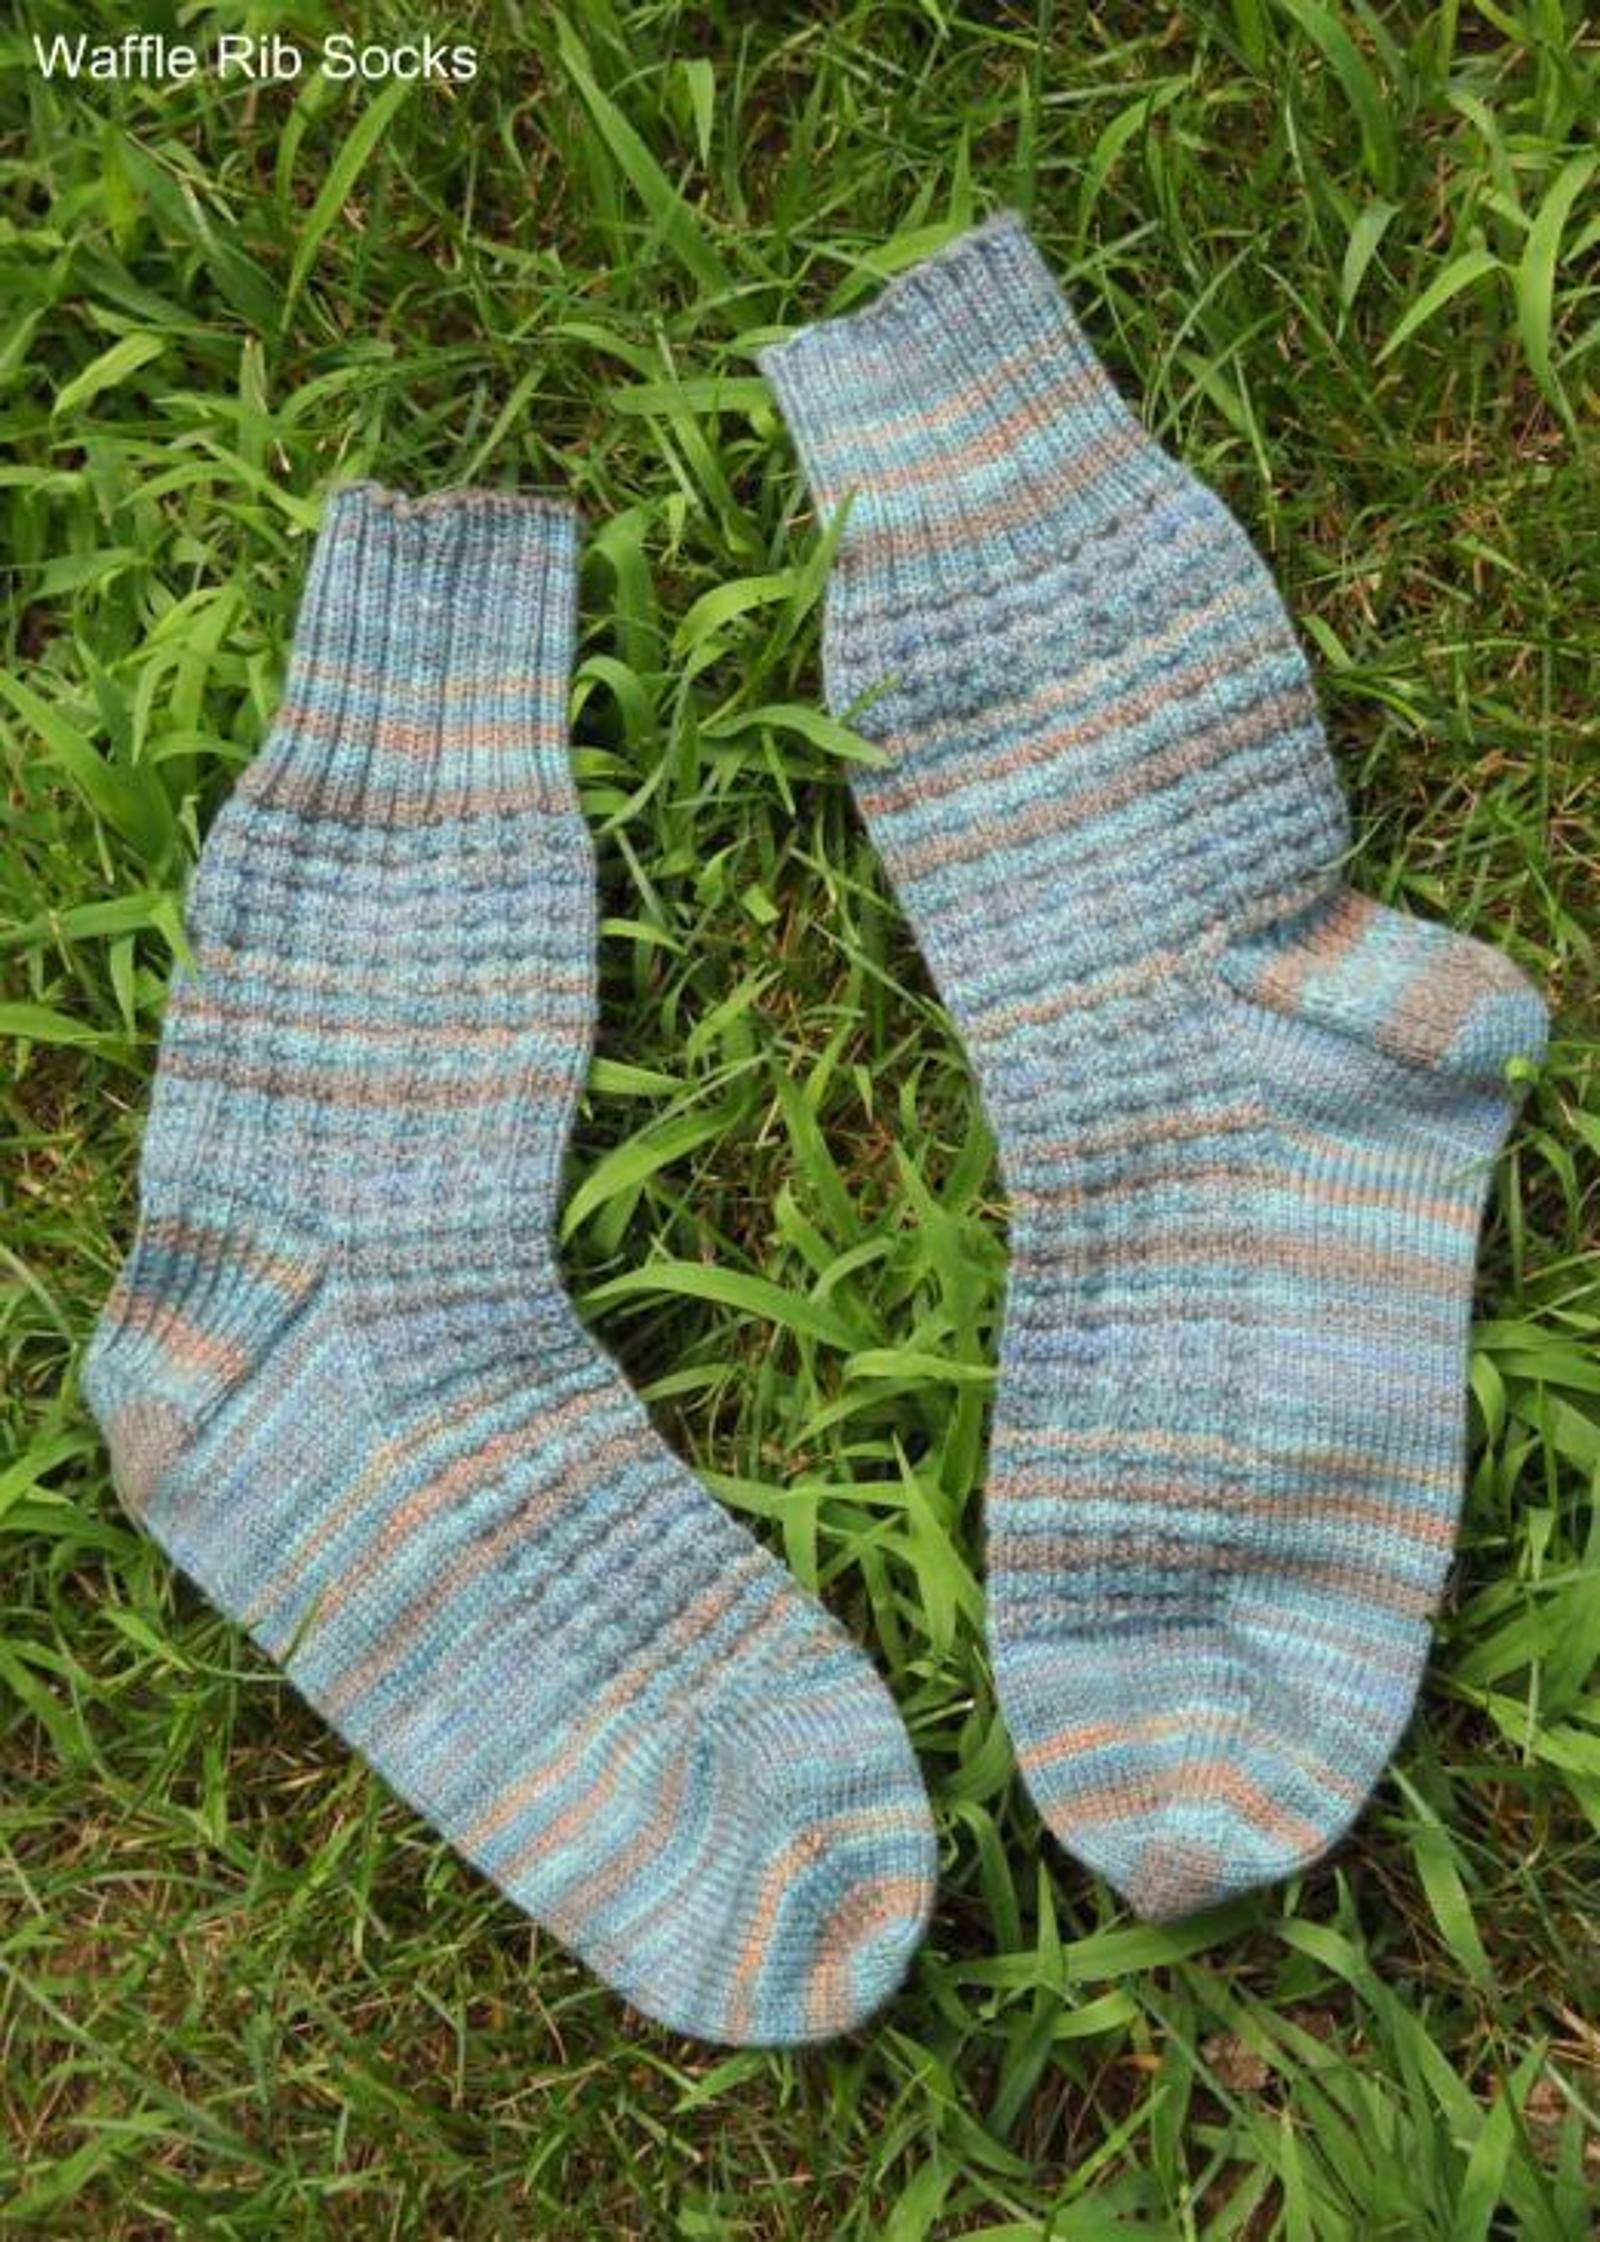 Waffle Rib Socks Knitting Pattern